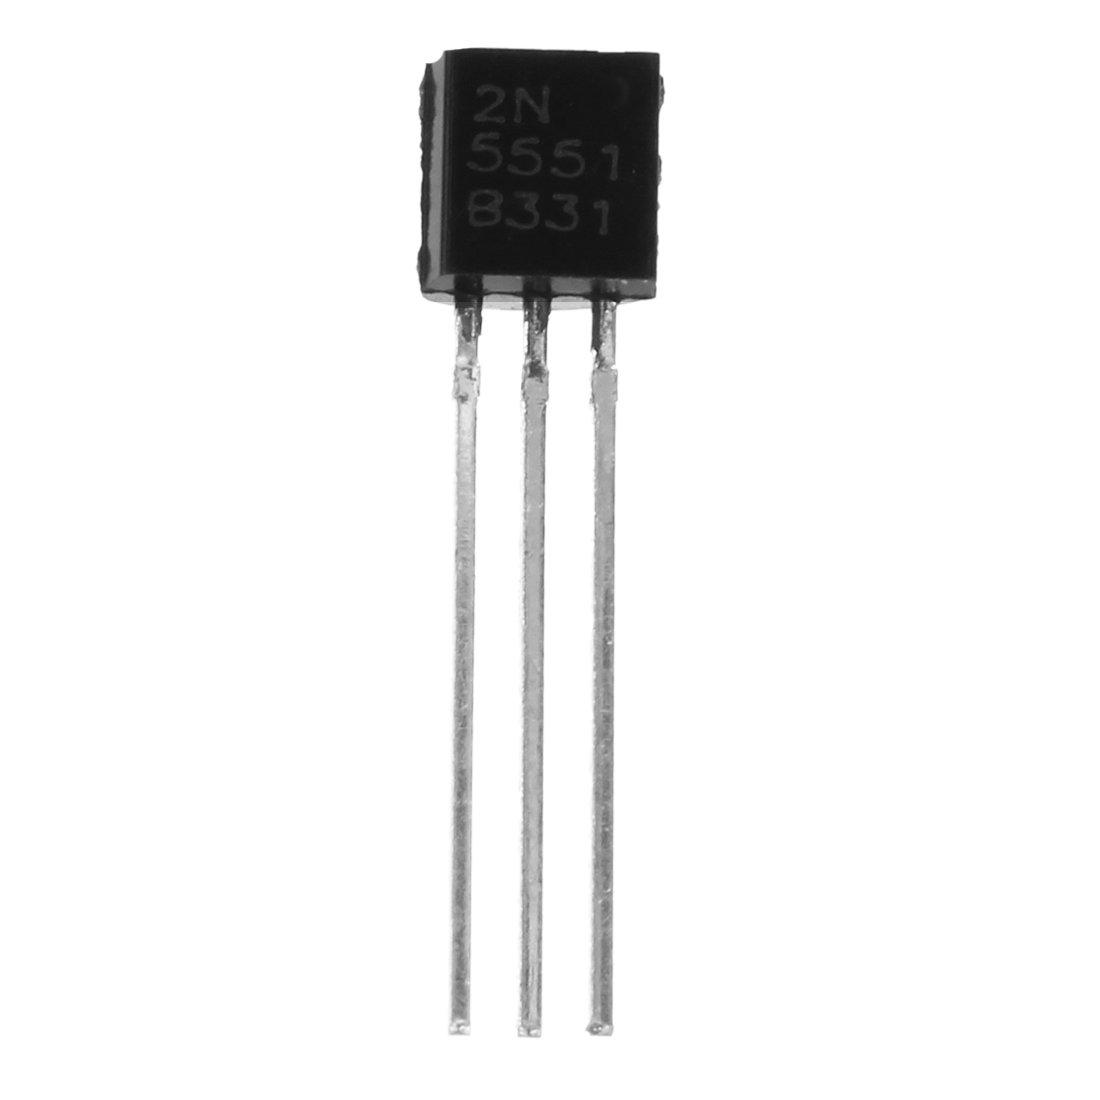 R 100 Stueck 2N5551 Durch das Loch NPN-Transistoren SODIAL